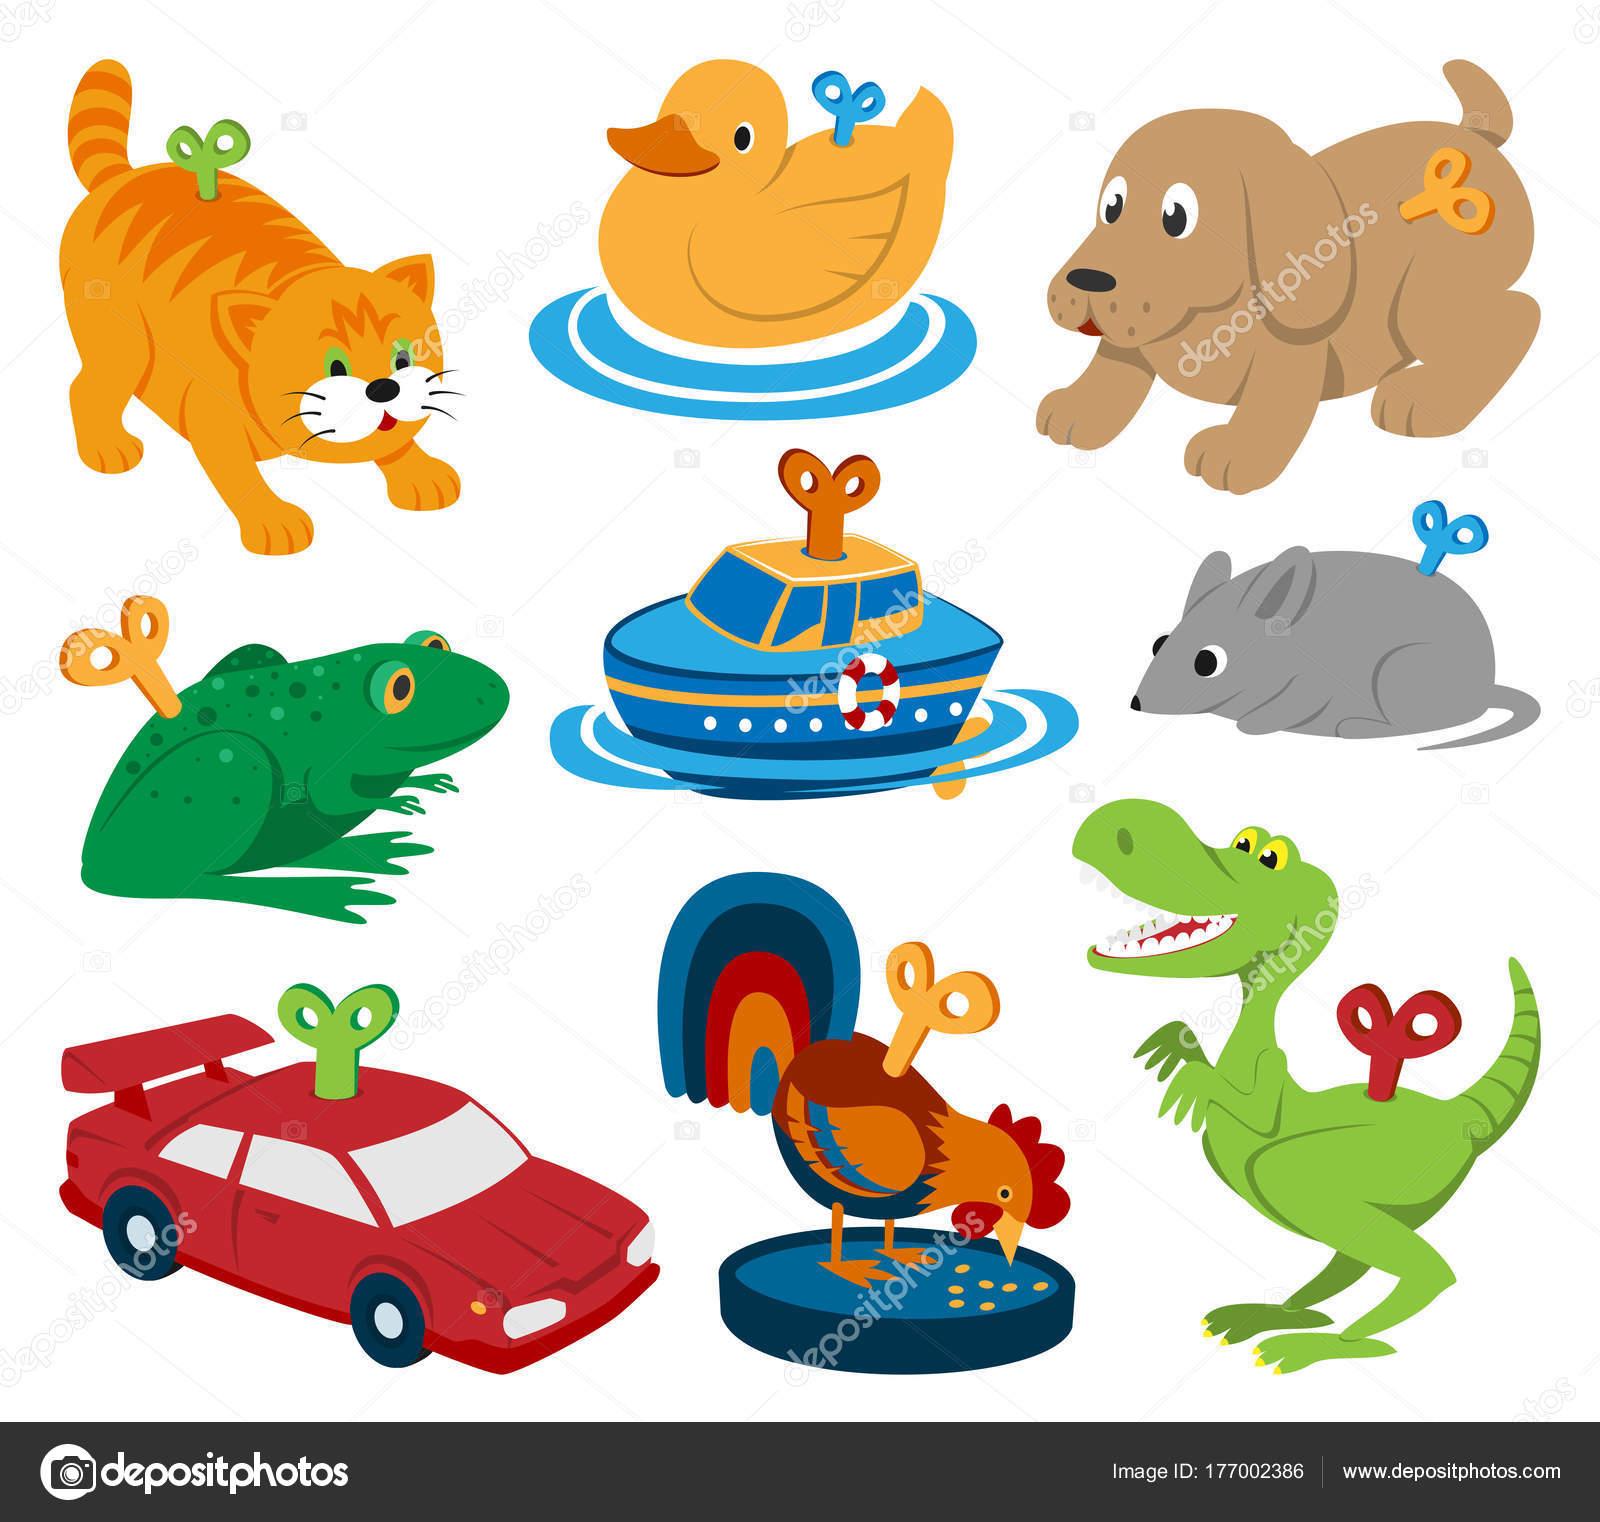 Kids vector toys clockwork key mechanism mechanic cartoon animals